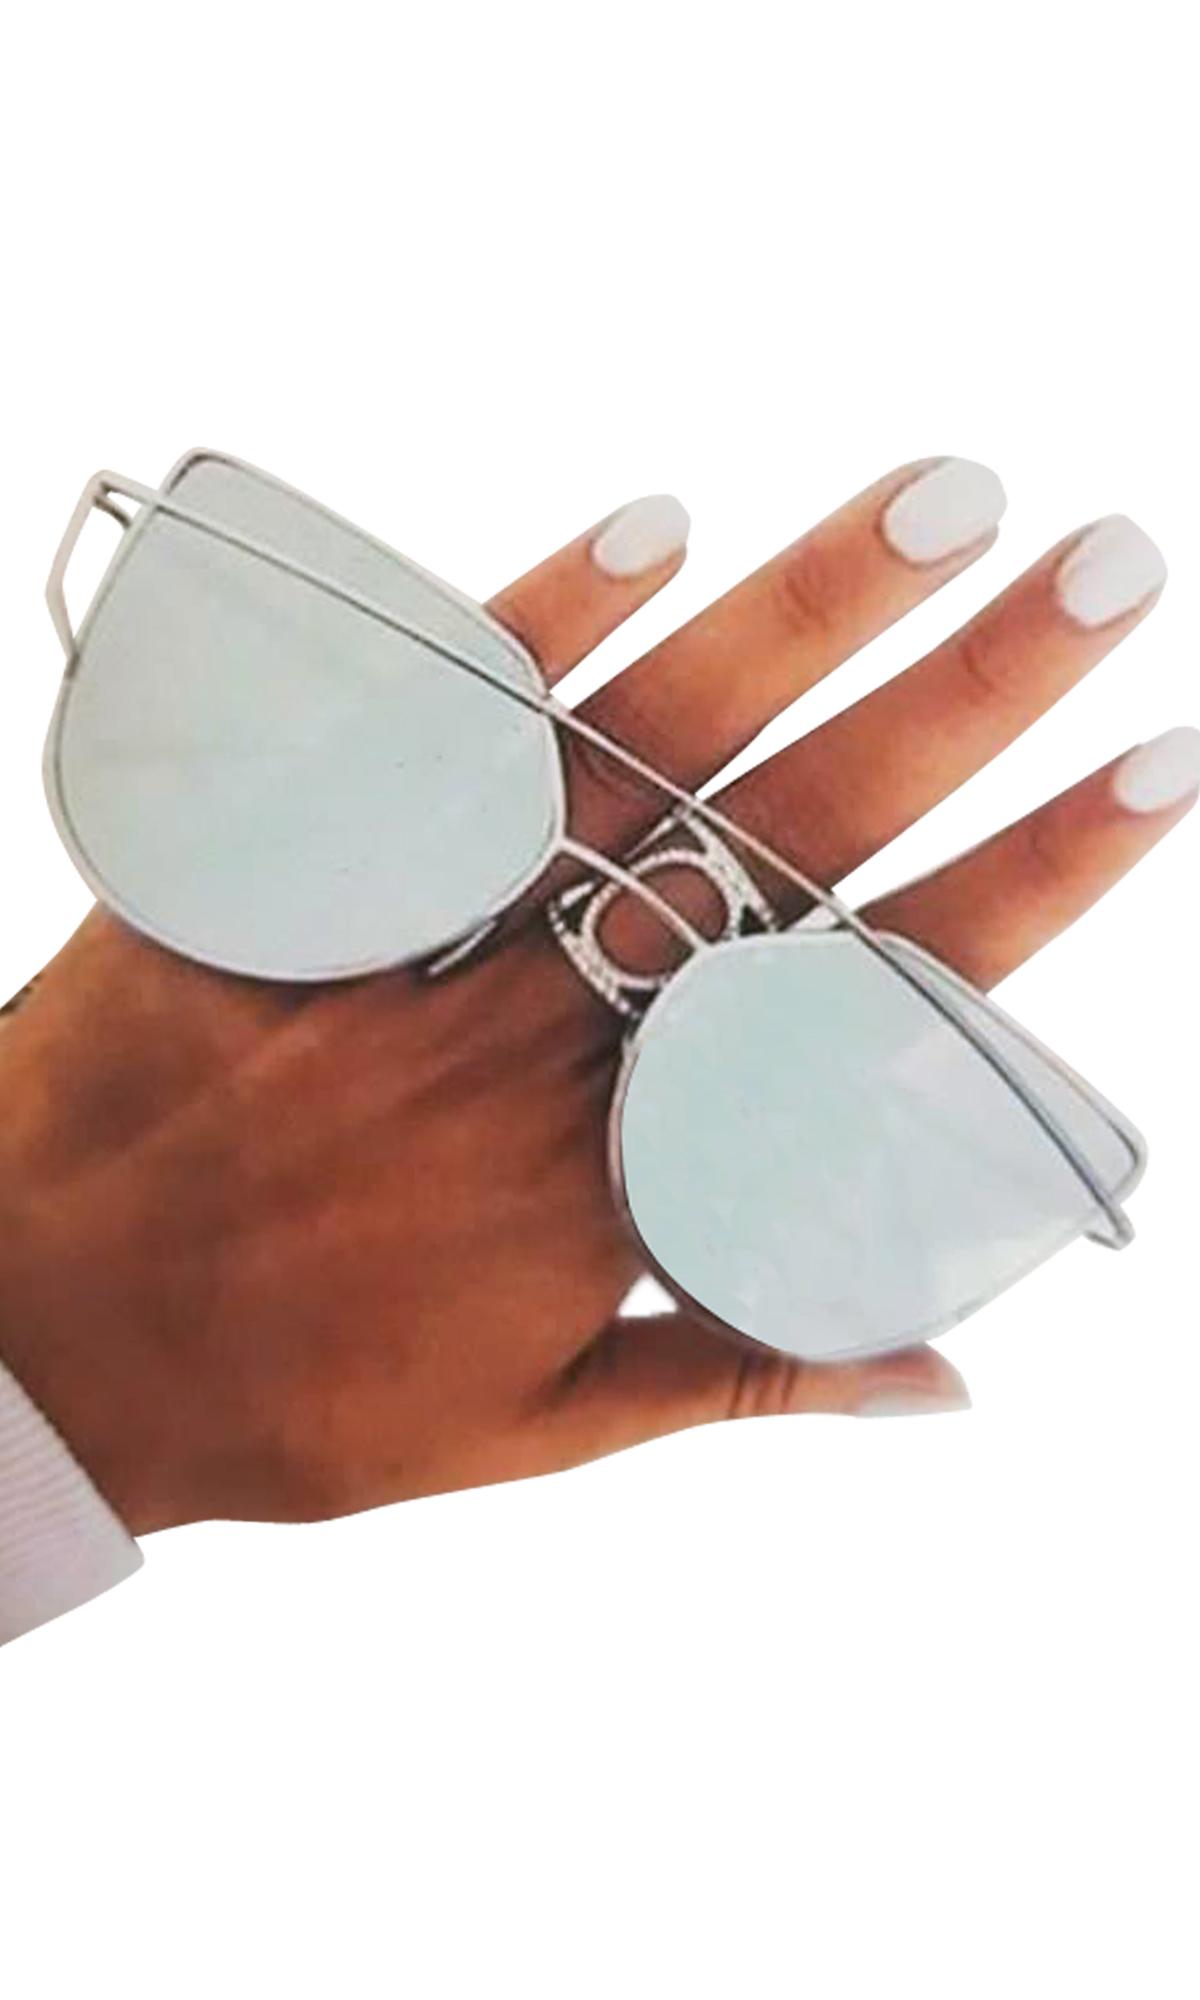 3eebe045cf5 Γυαλιά ηλίου με καθρέπτες | Γυναικεία αξεσουάρ από τη Miss Reina ...